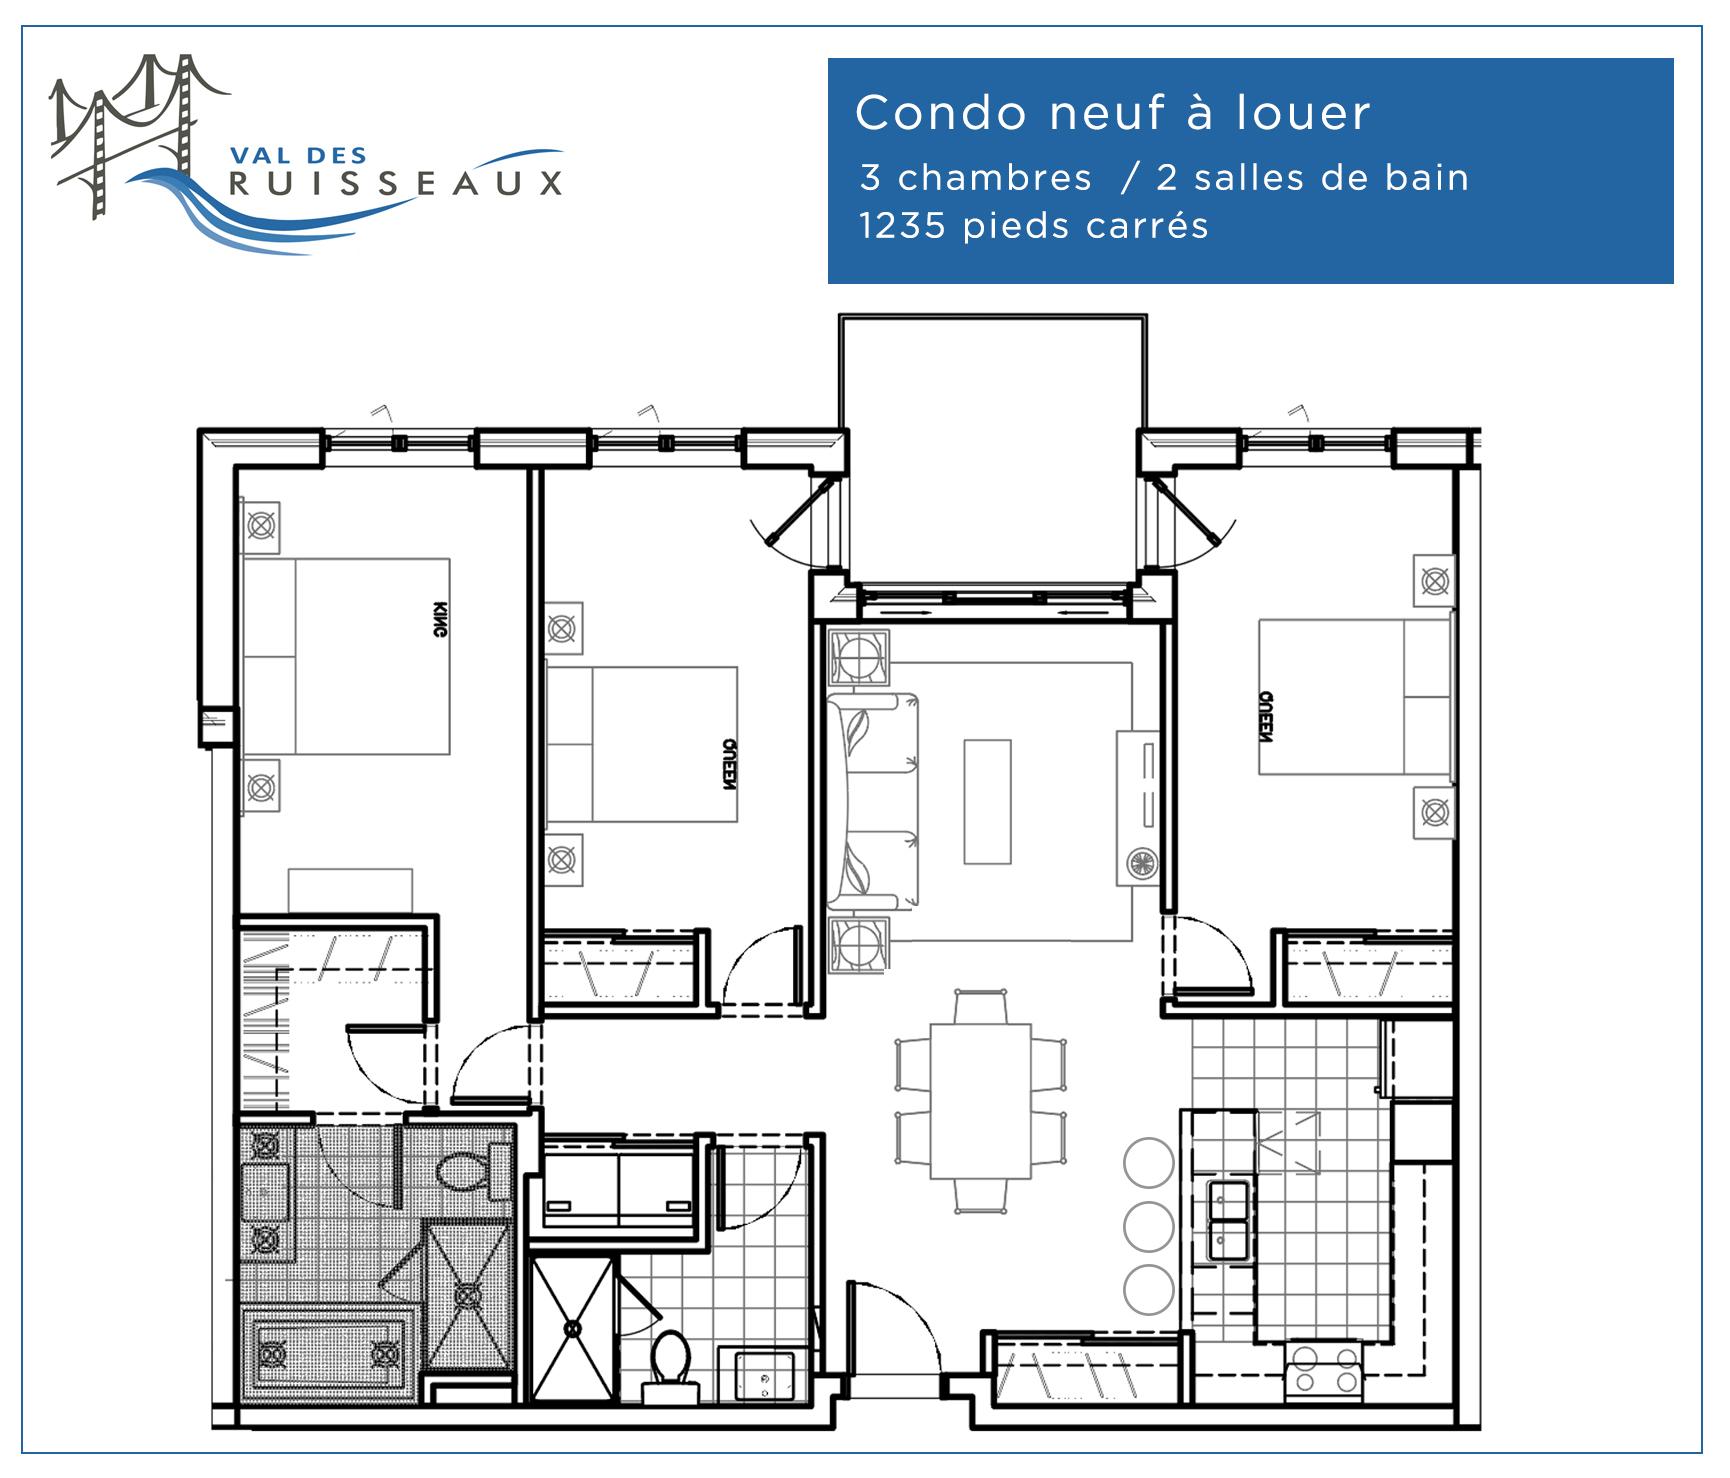 plans-vdr-2cac-v3-fr